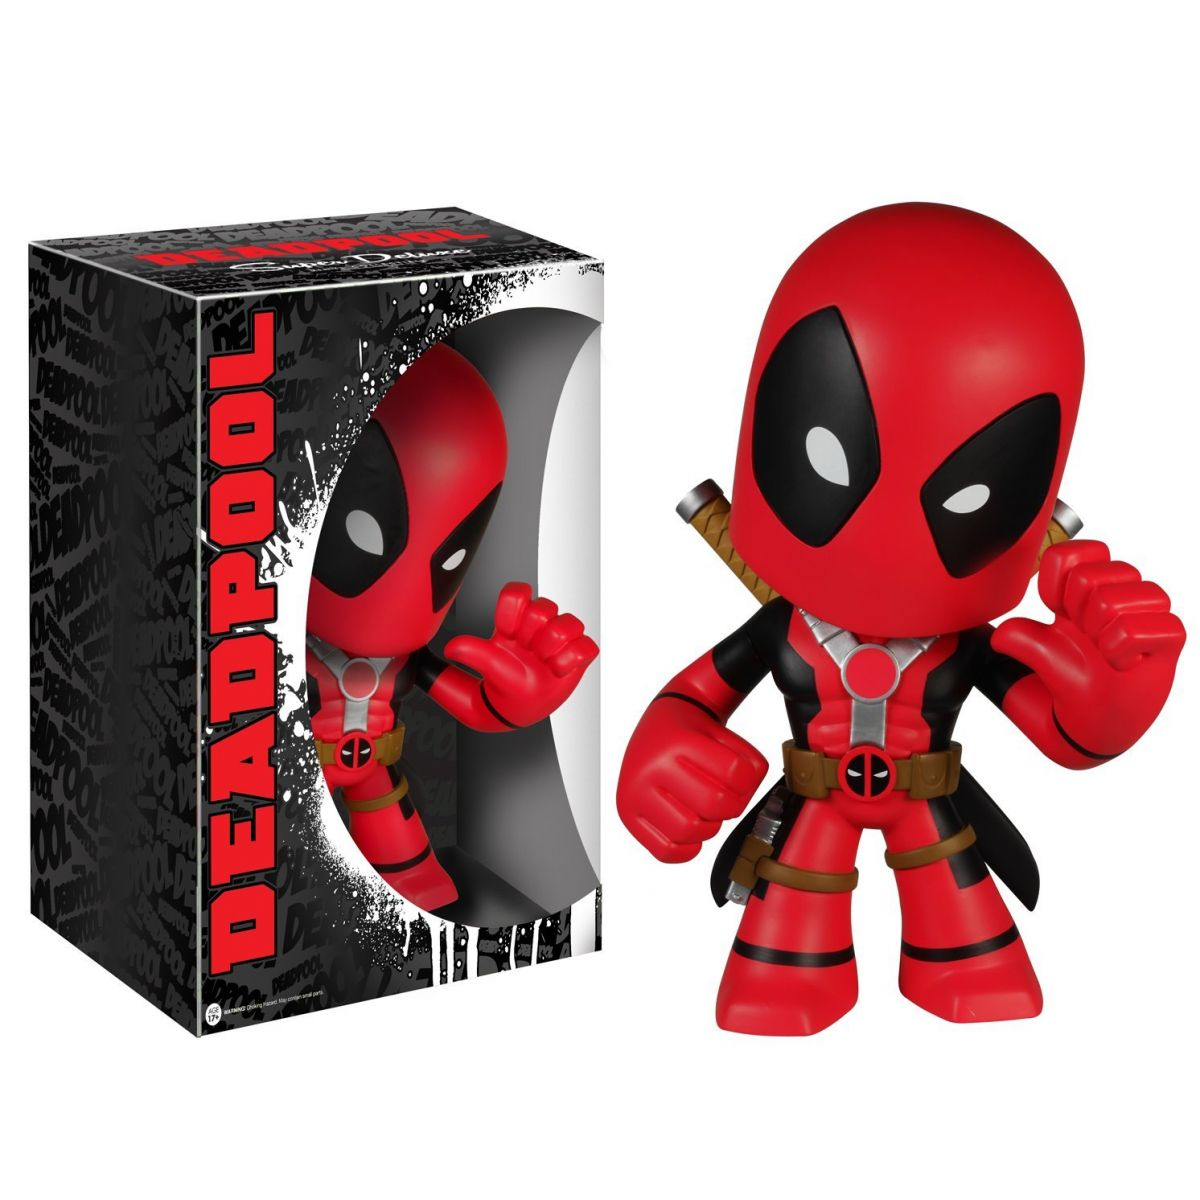 Funko Super Deluxe Vinyl: Marvel - Deadpool Action Figure  - Movie Freaks Collectibles